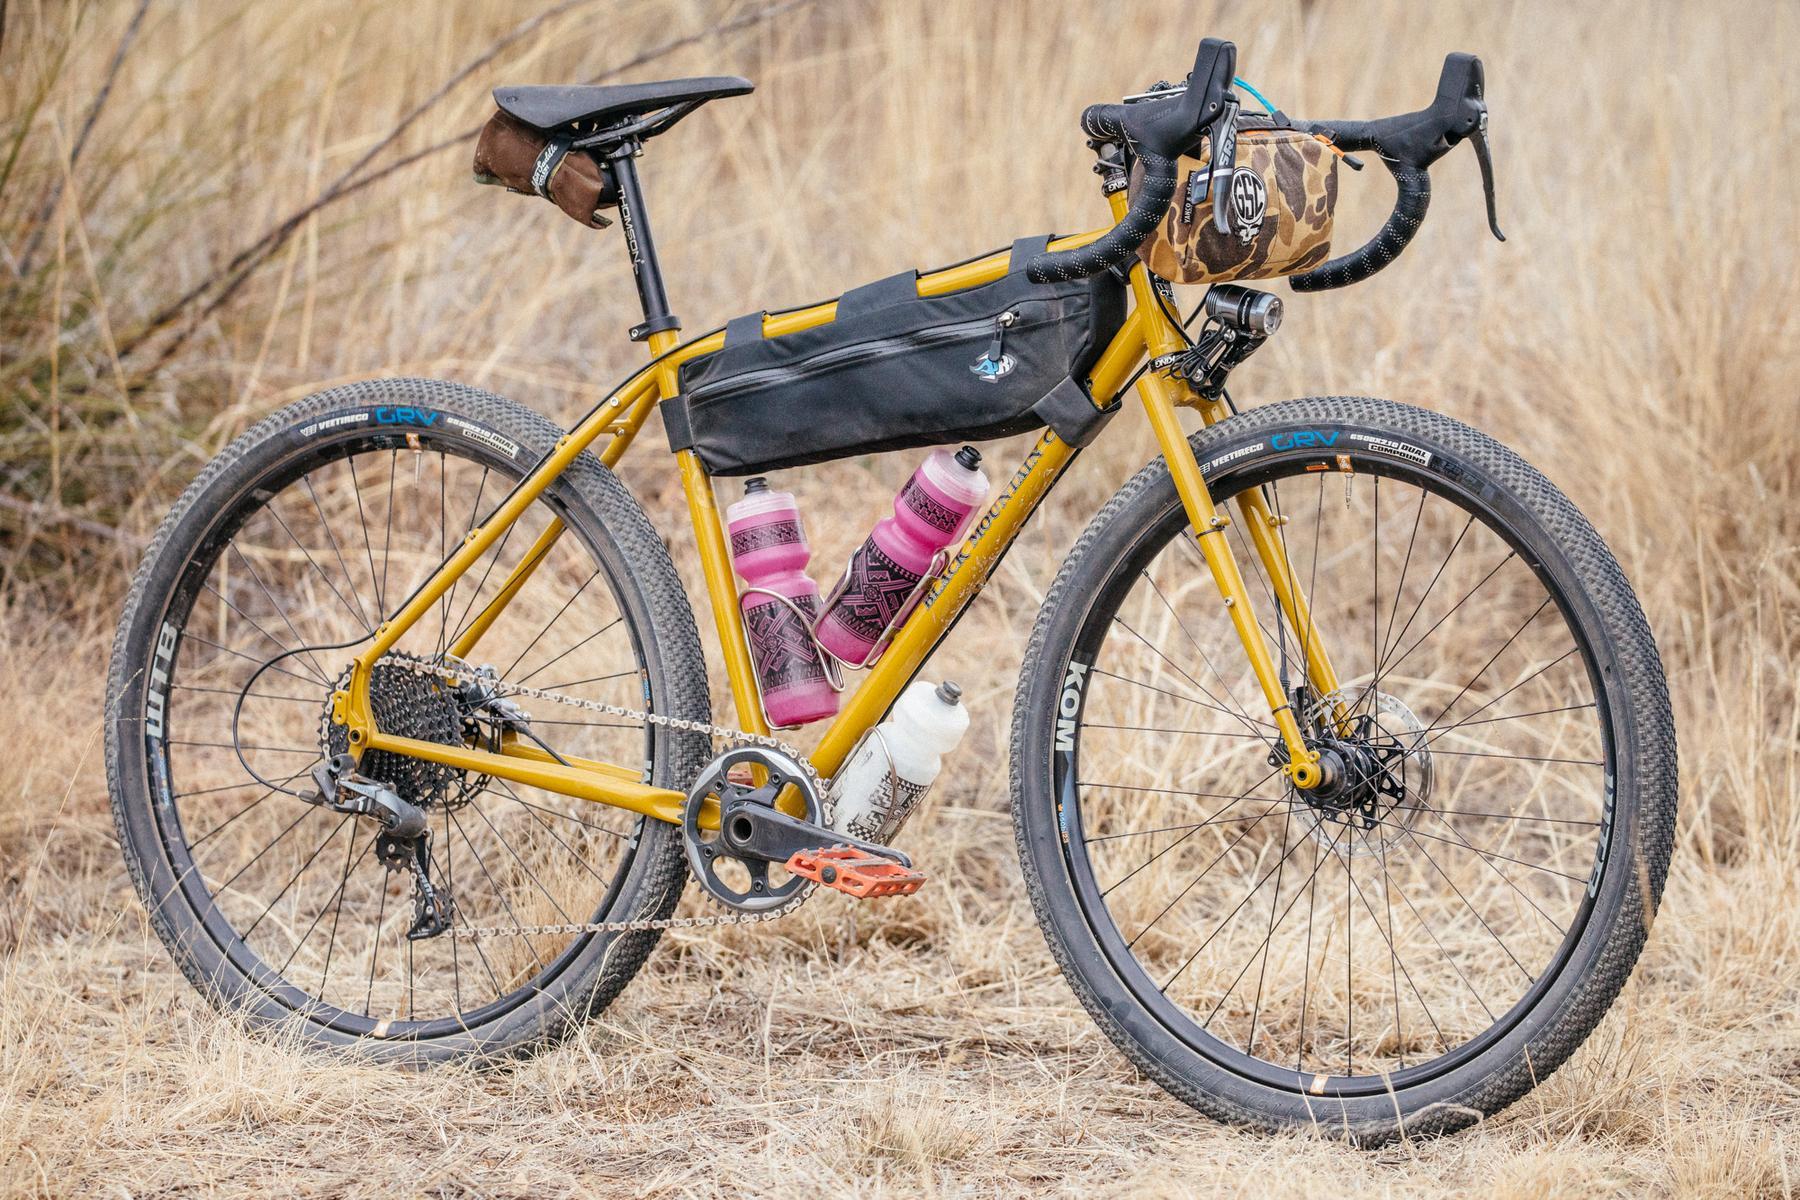 Spencers-Black-Mountain-Cycles-MCD-Dirt-Tourer-3.jpg